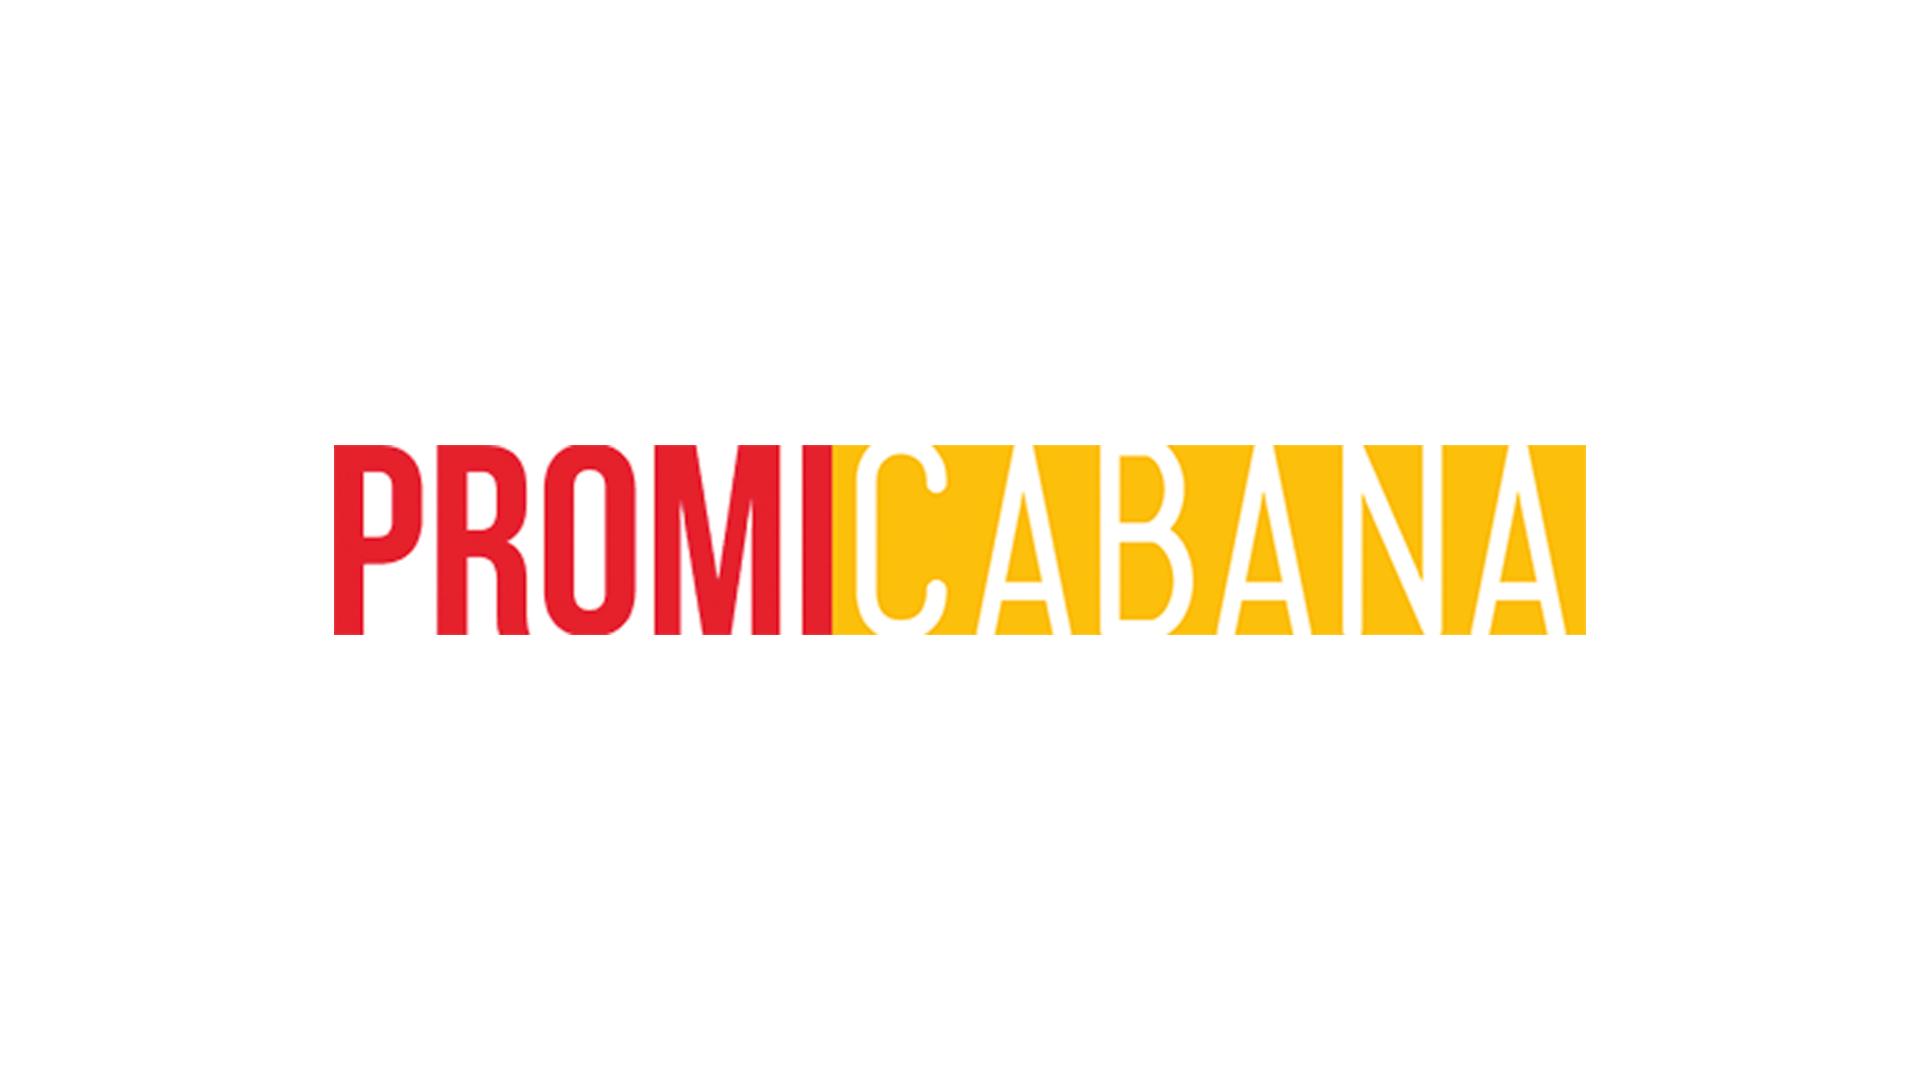 Christina-Aguilera-Jimmy-Fallon-Your-Body